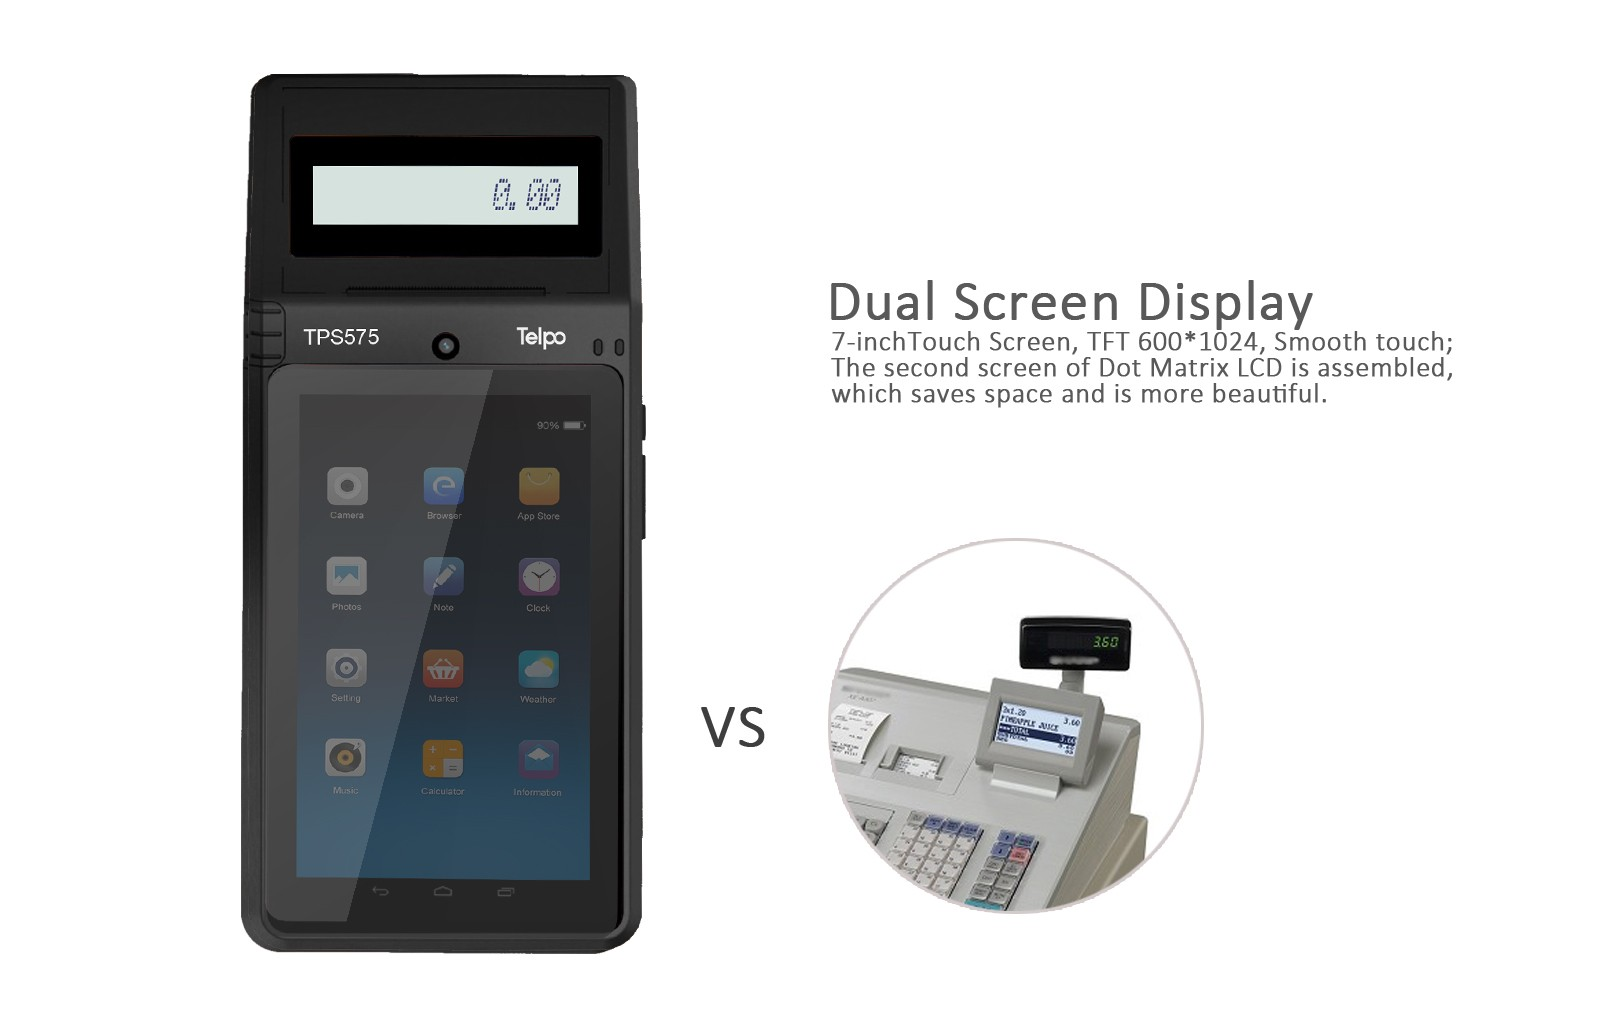 Dual Screen Desktop Smart POS with Barcode Scanner